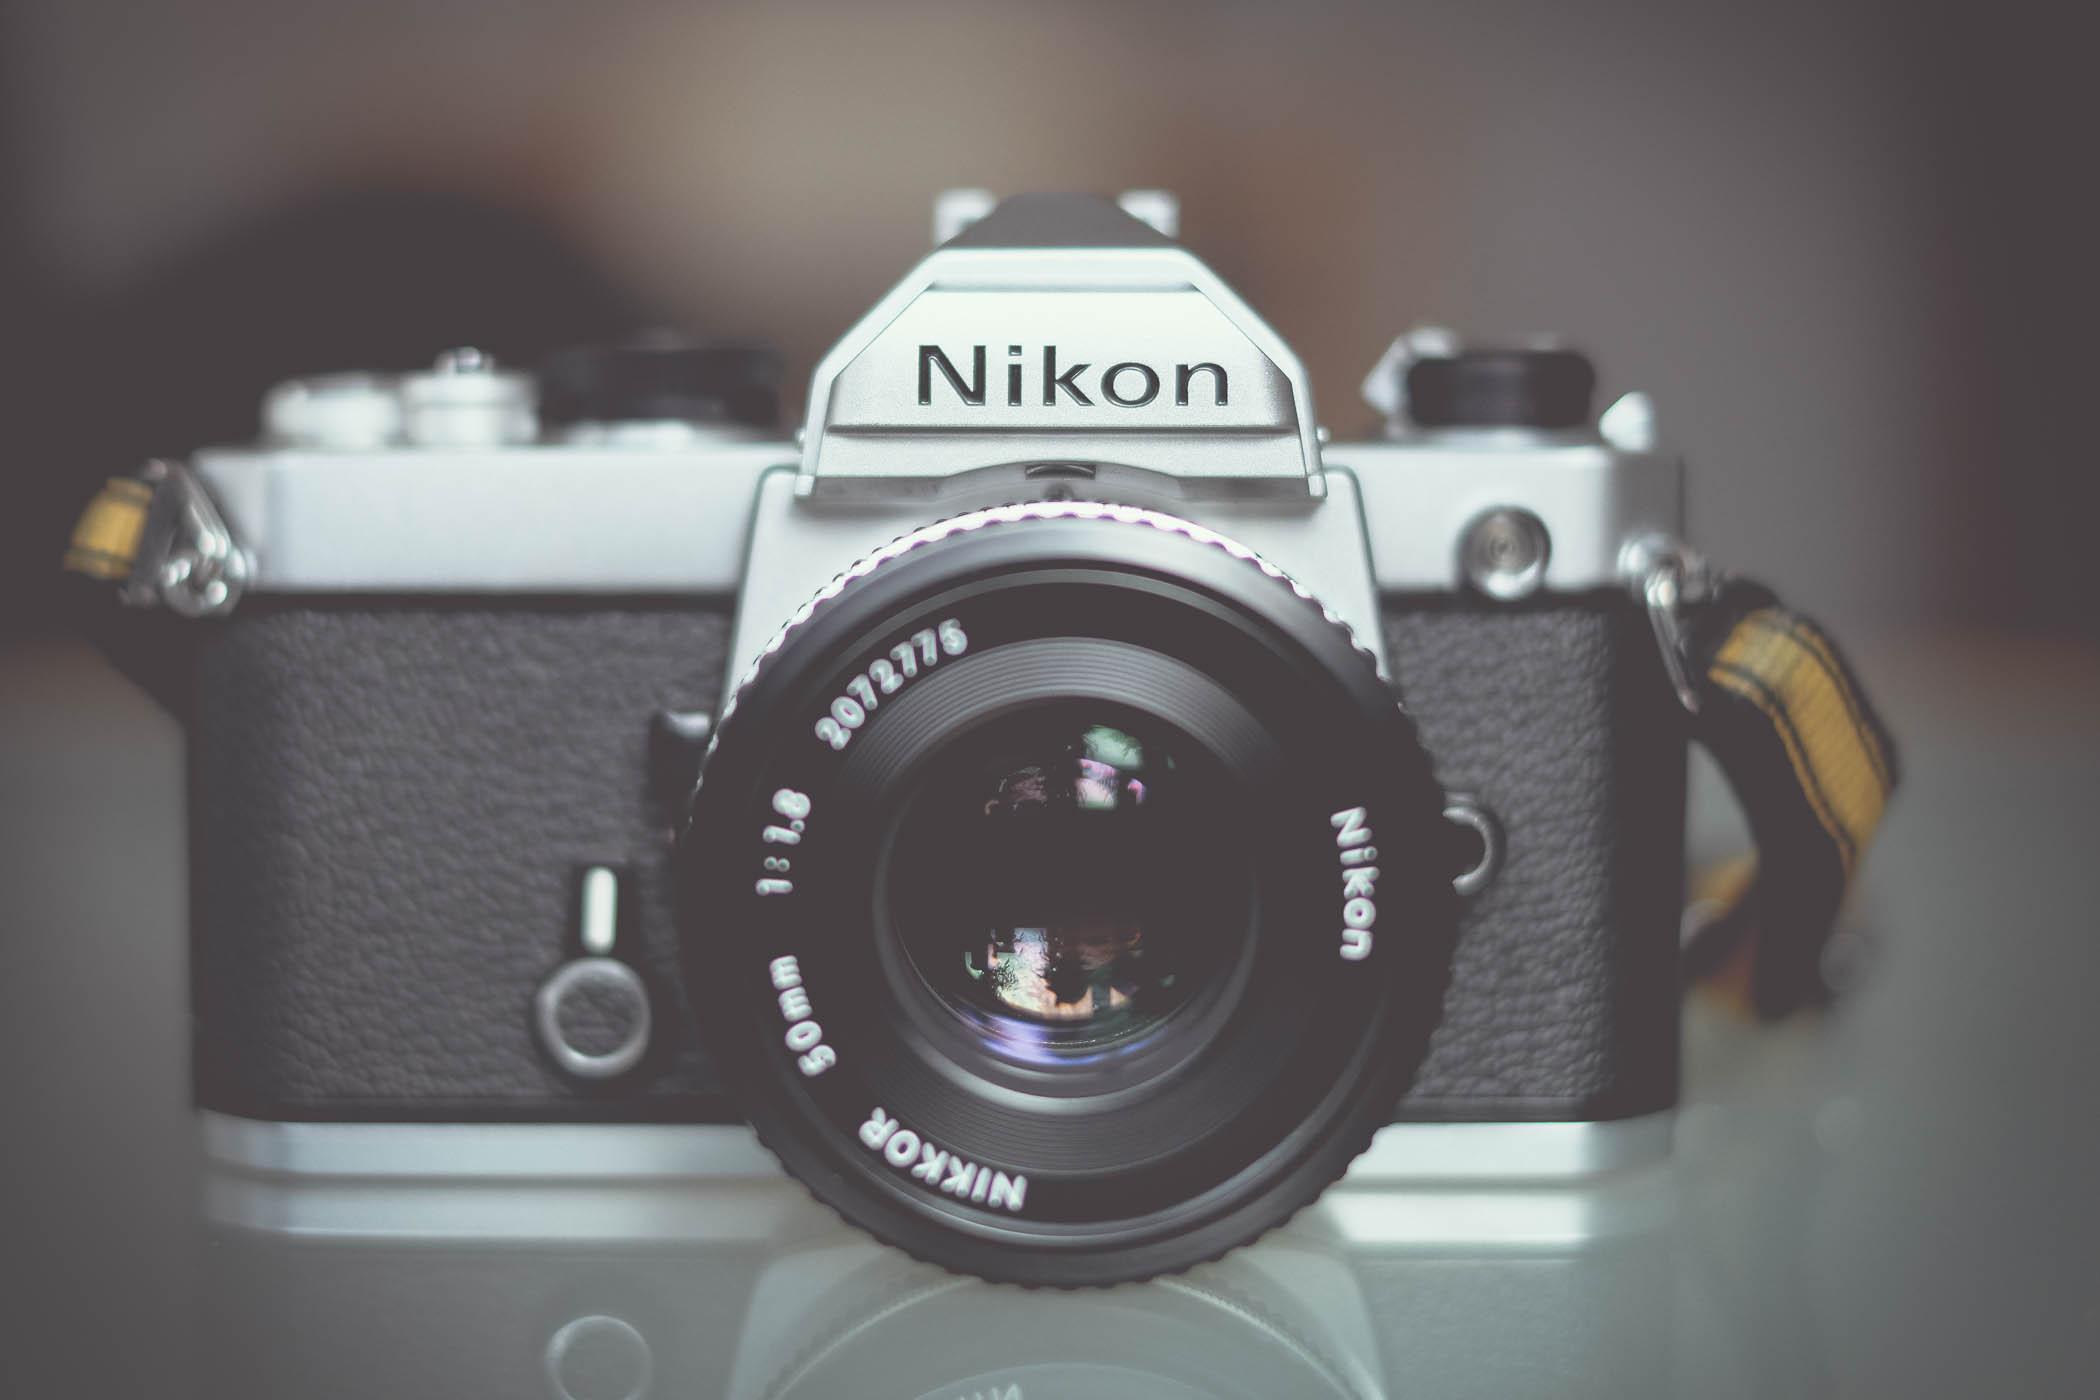 my first Nikon